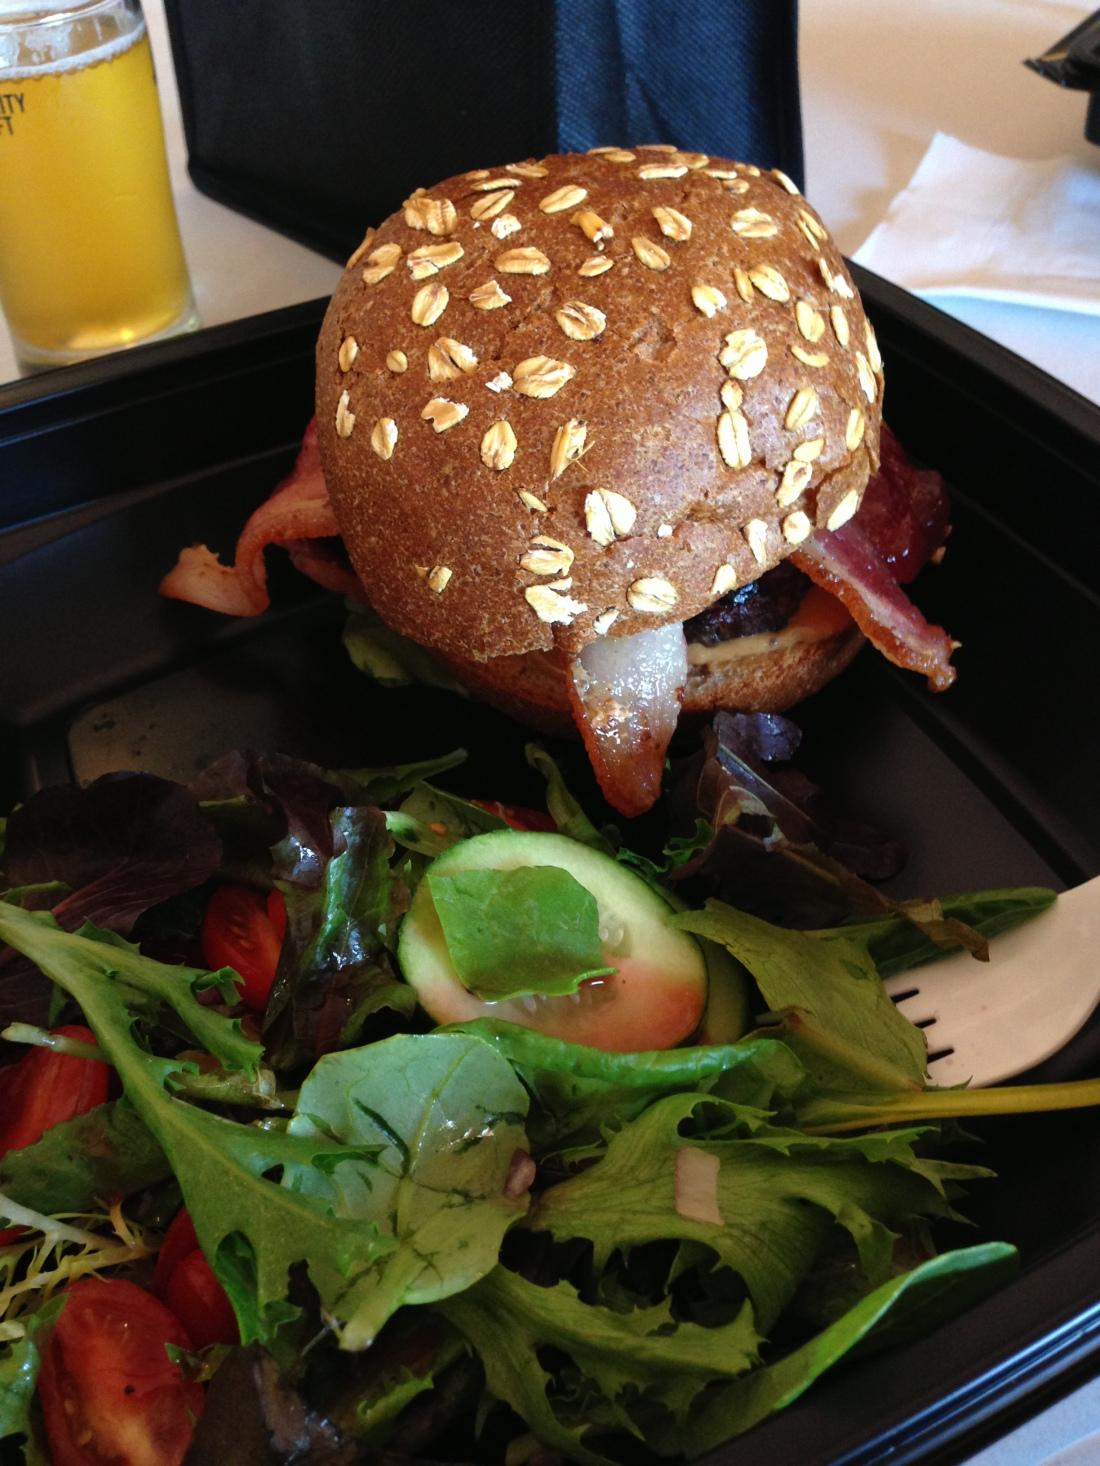 Slater's 50/50 Peanut Butter & Jeallousy Burger